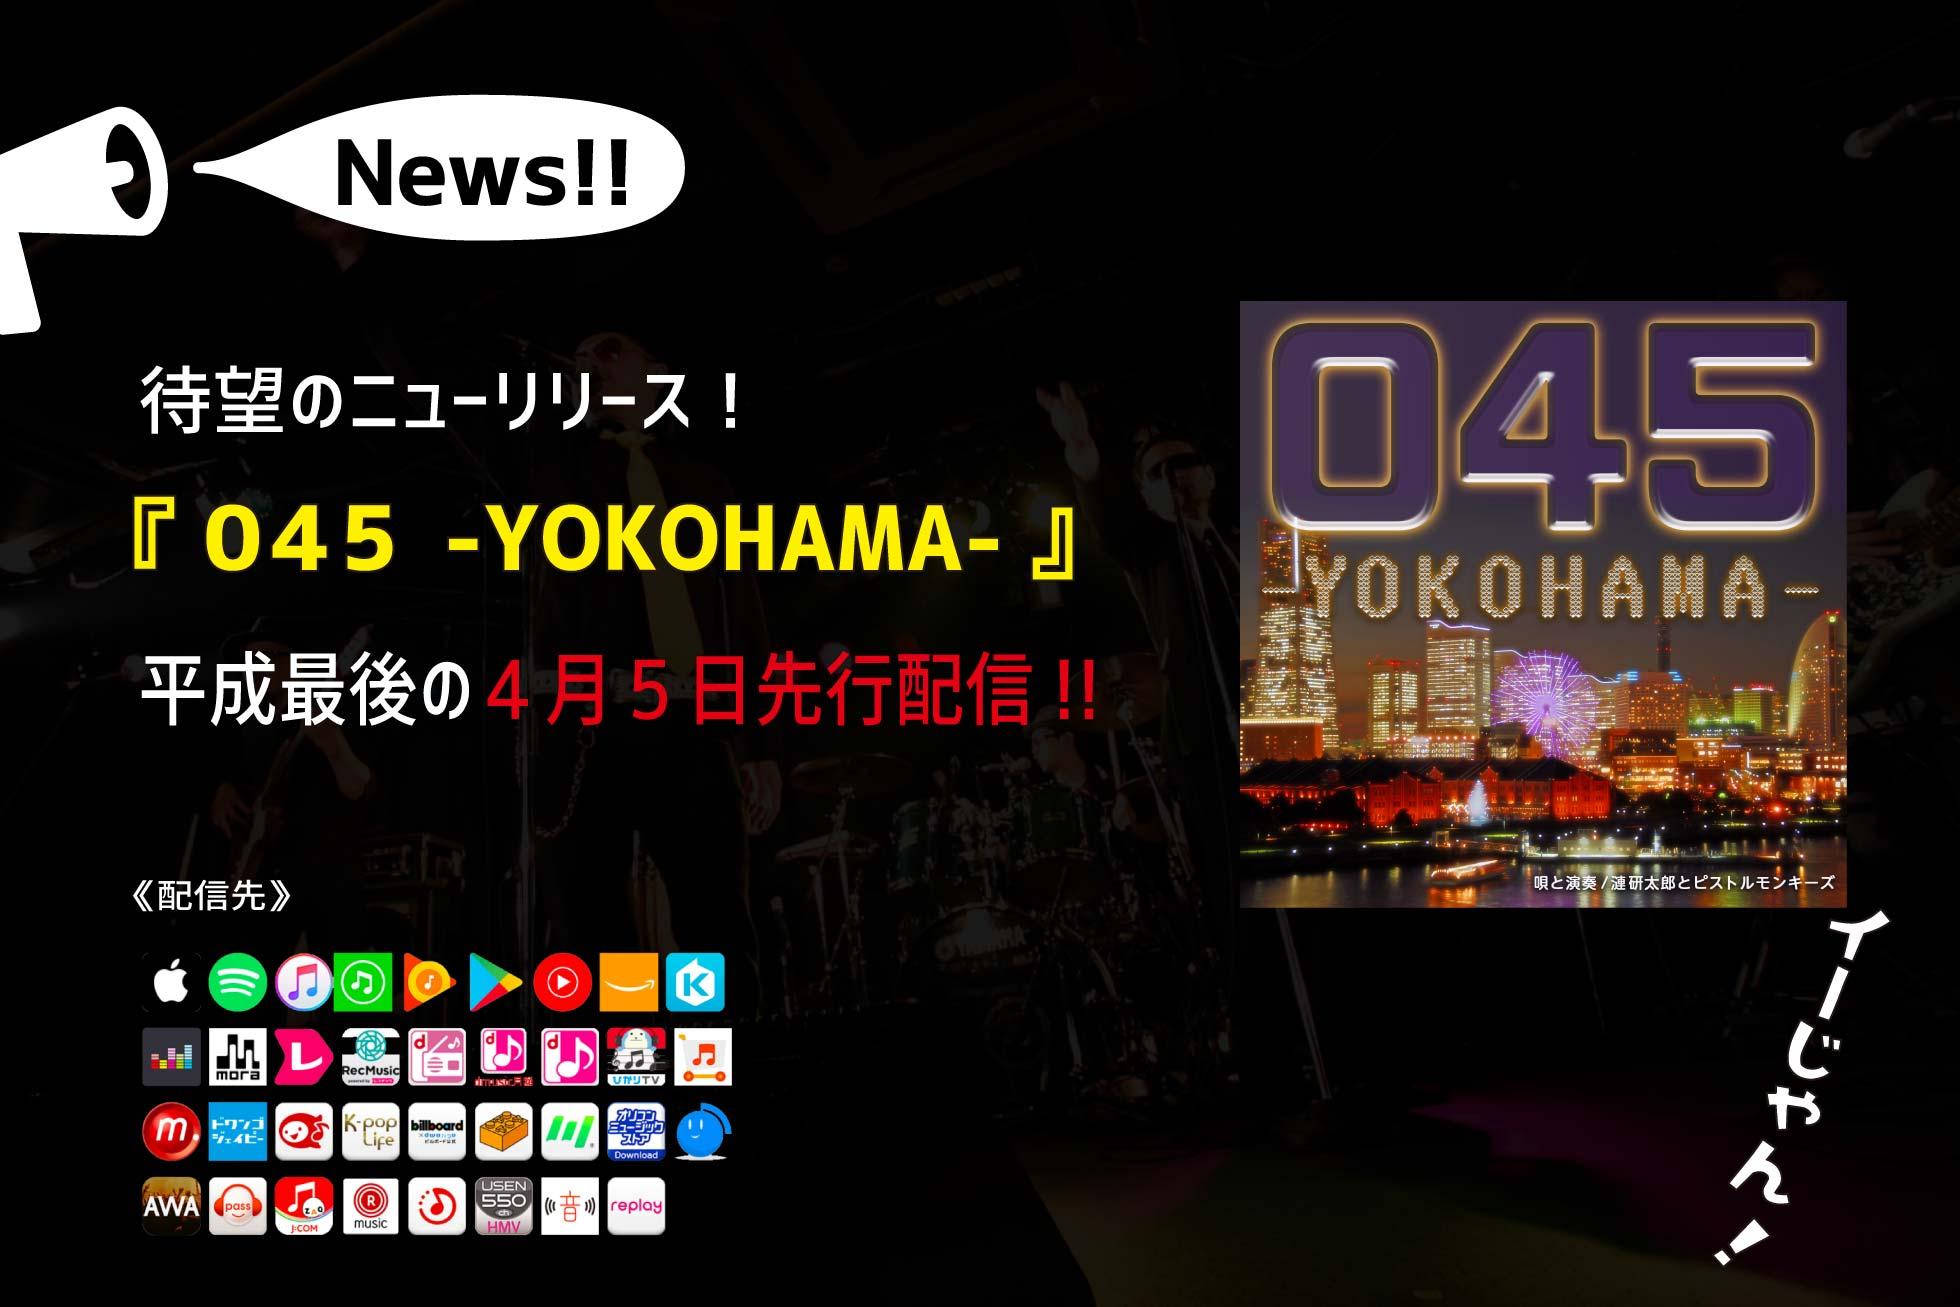 045 -YOKOHAMA-